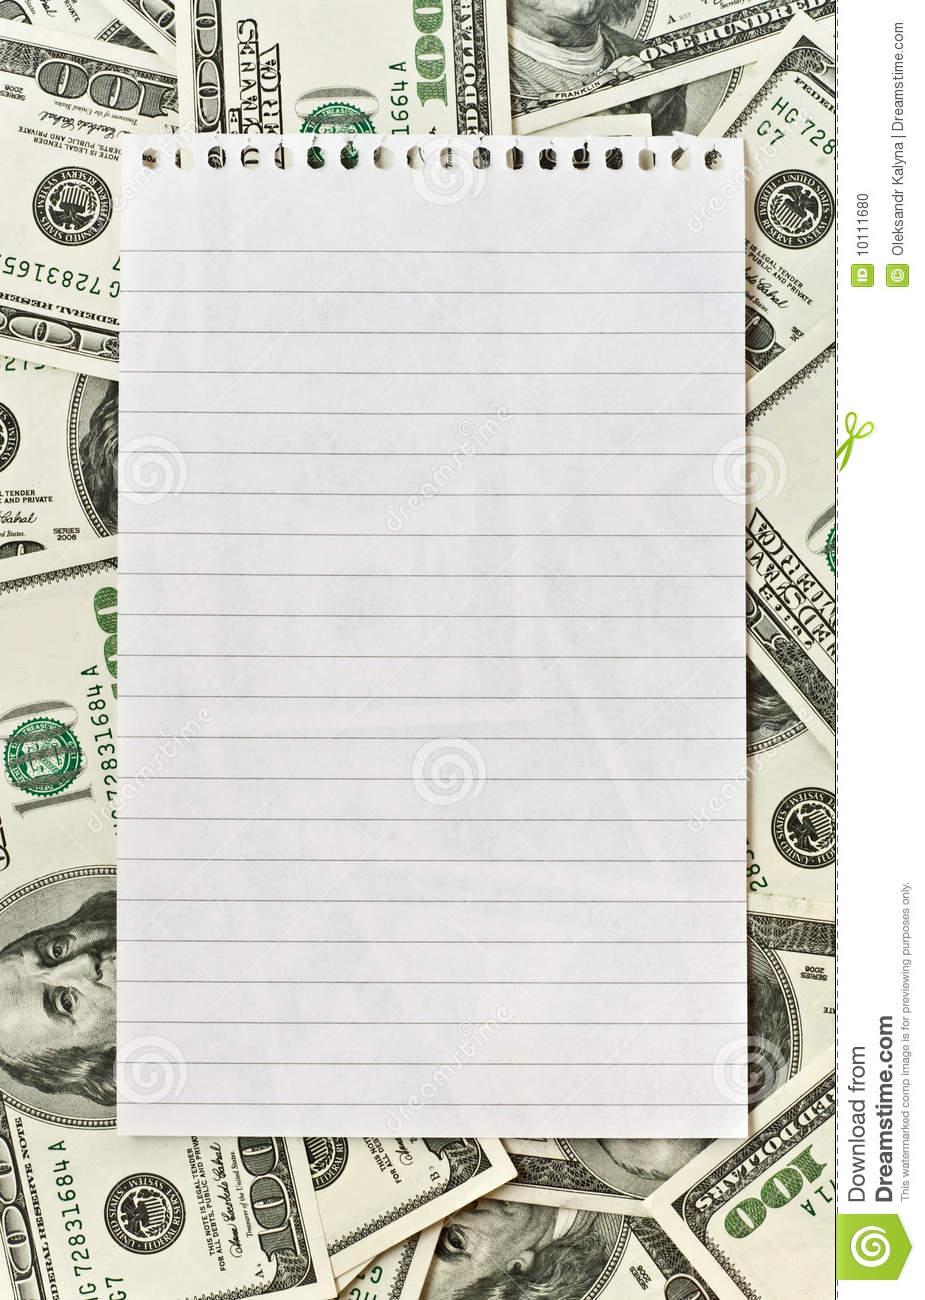 016 Blank White Paper Over Money Background Write Essays For Essay Best Uni College Scholarship Full